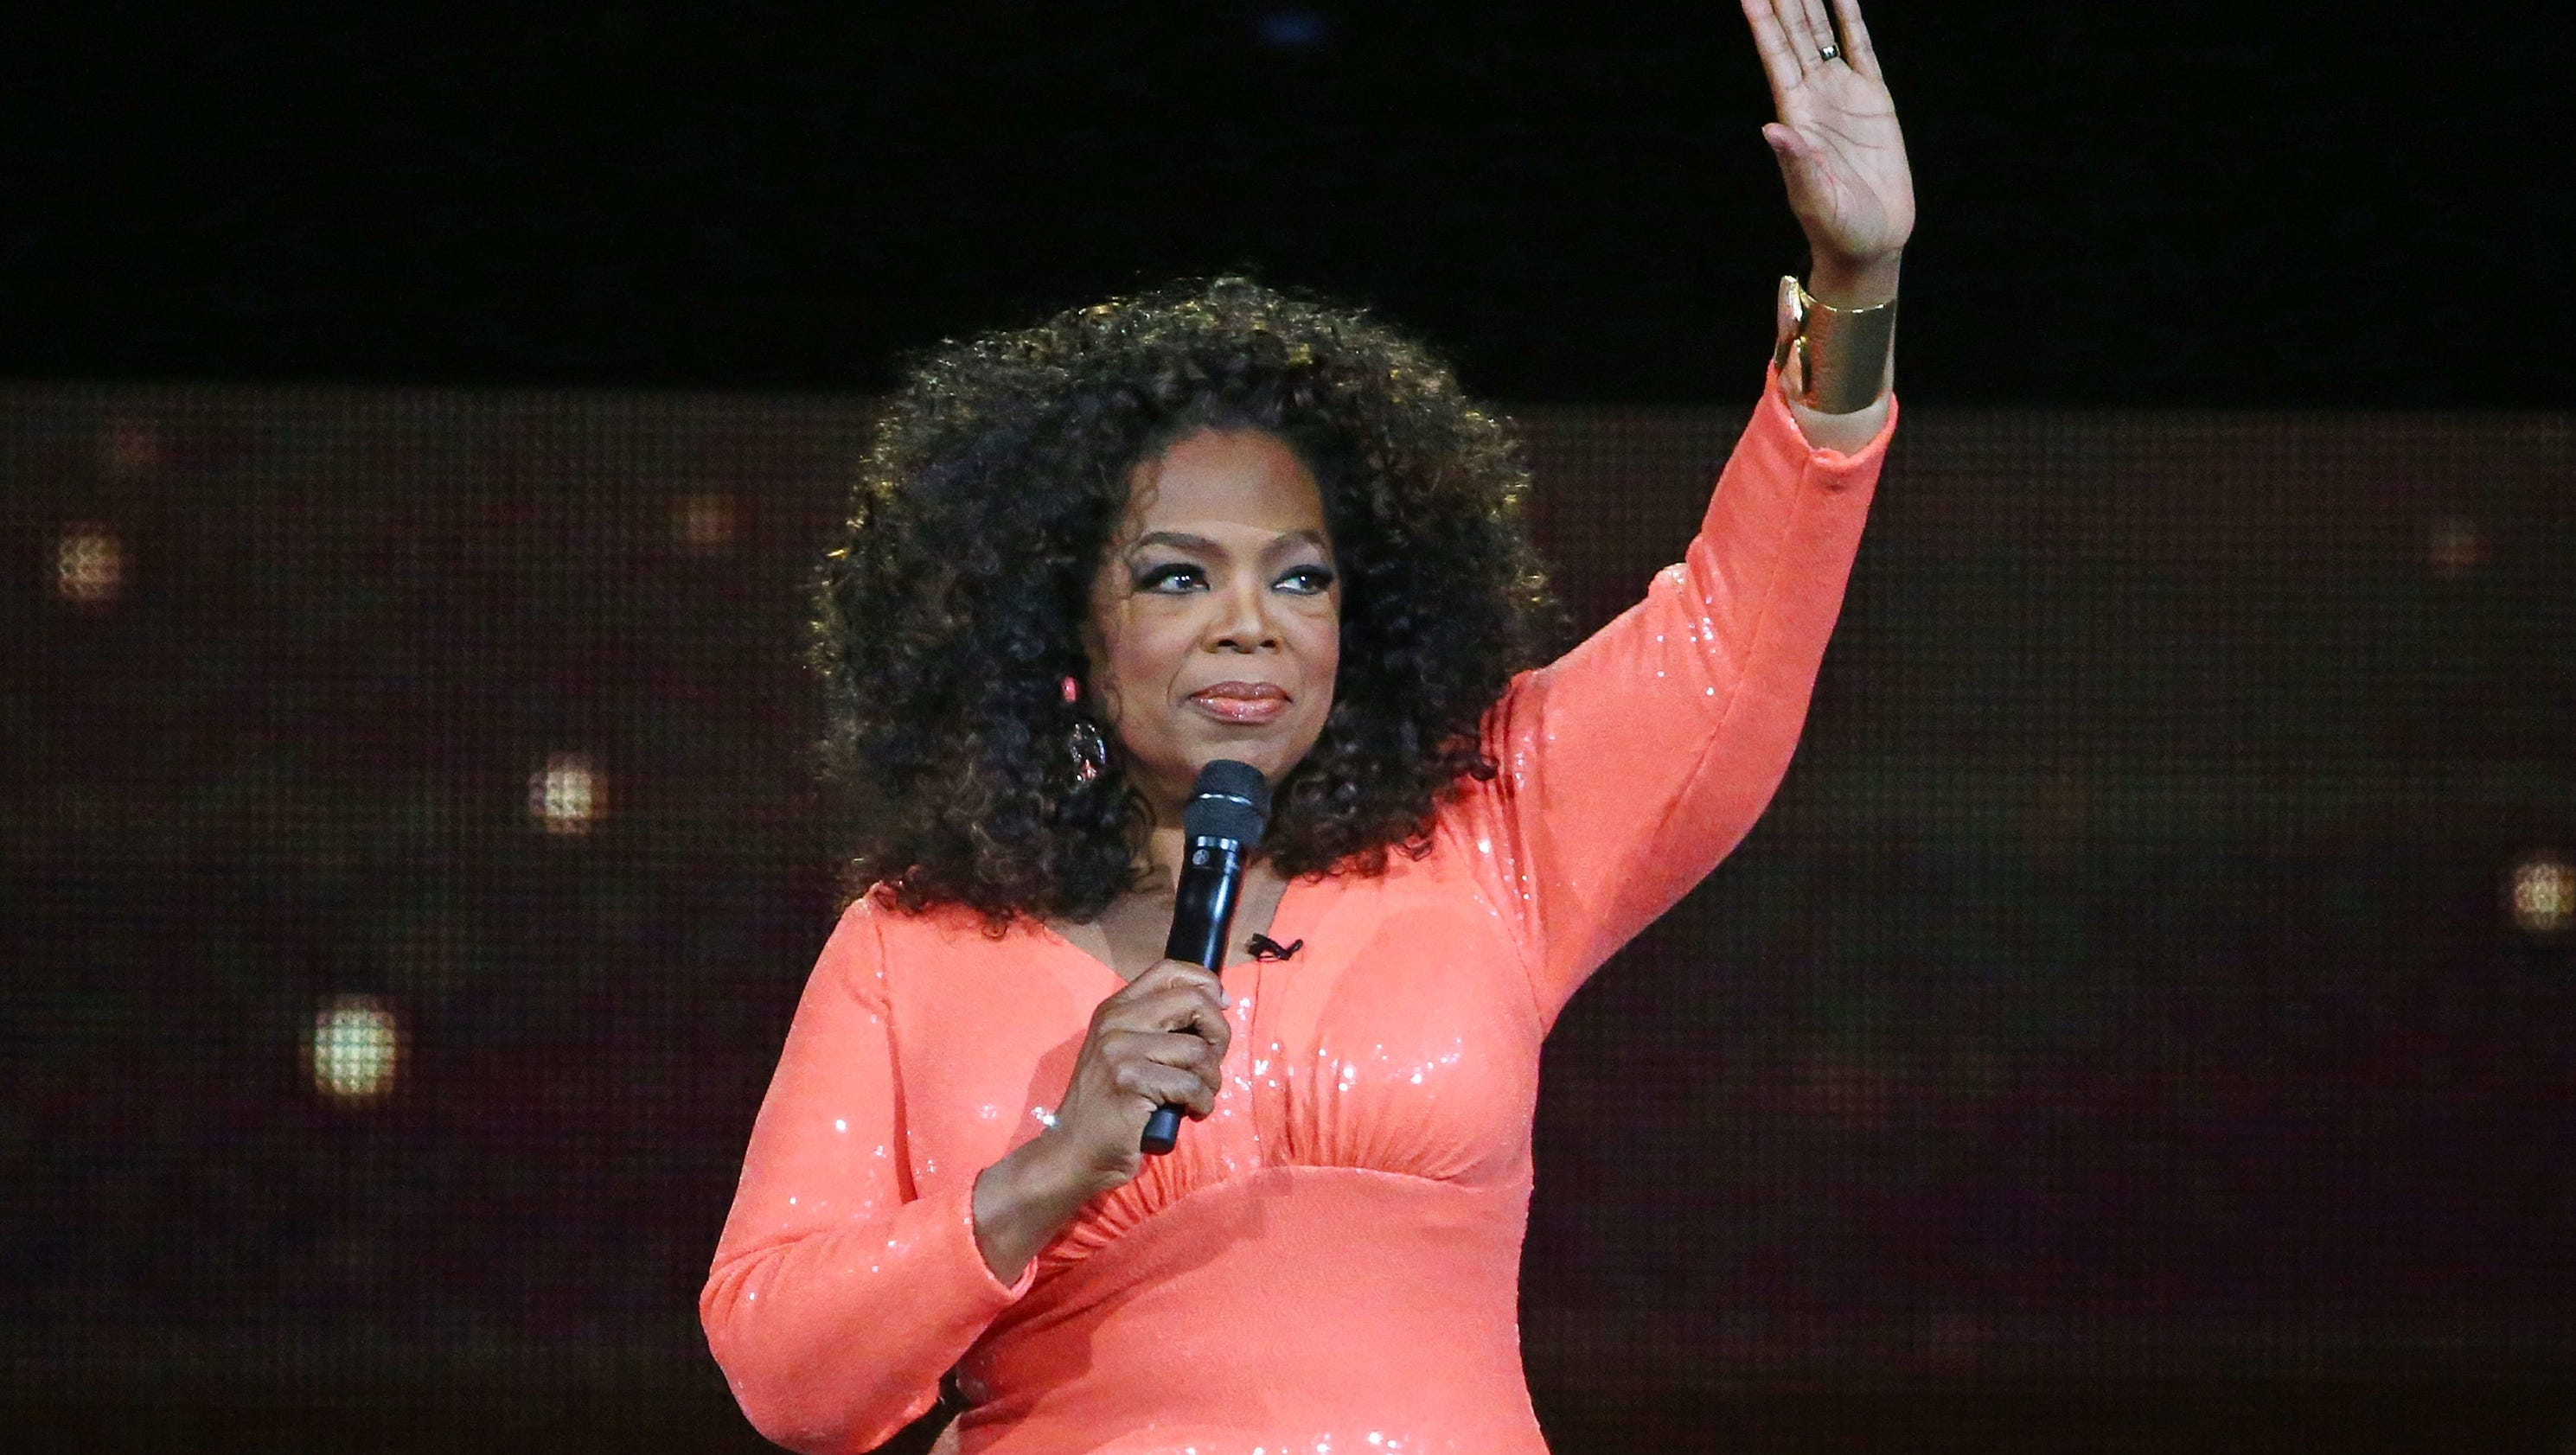 oprah winfrey inspirational essay 91 121 113 106 oprah winfrey inspirational essay